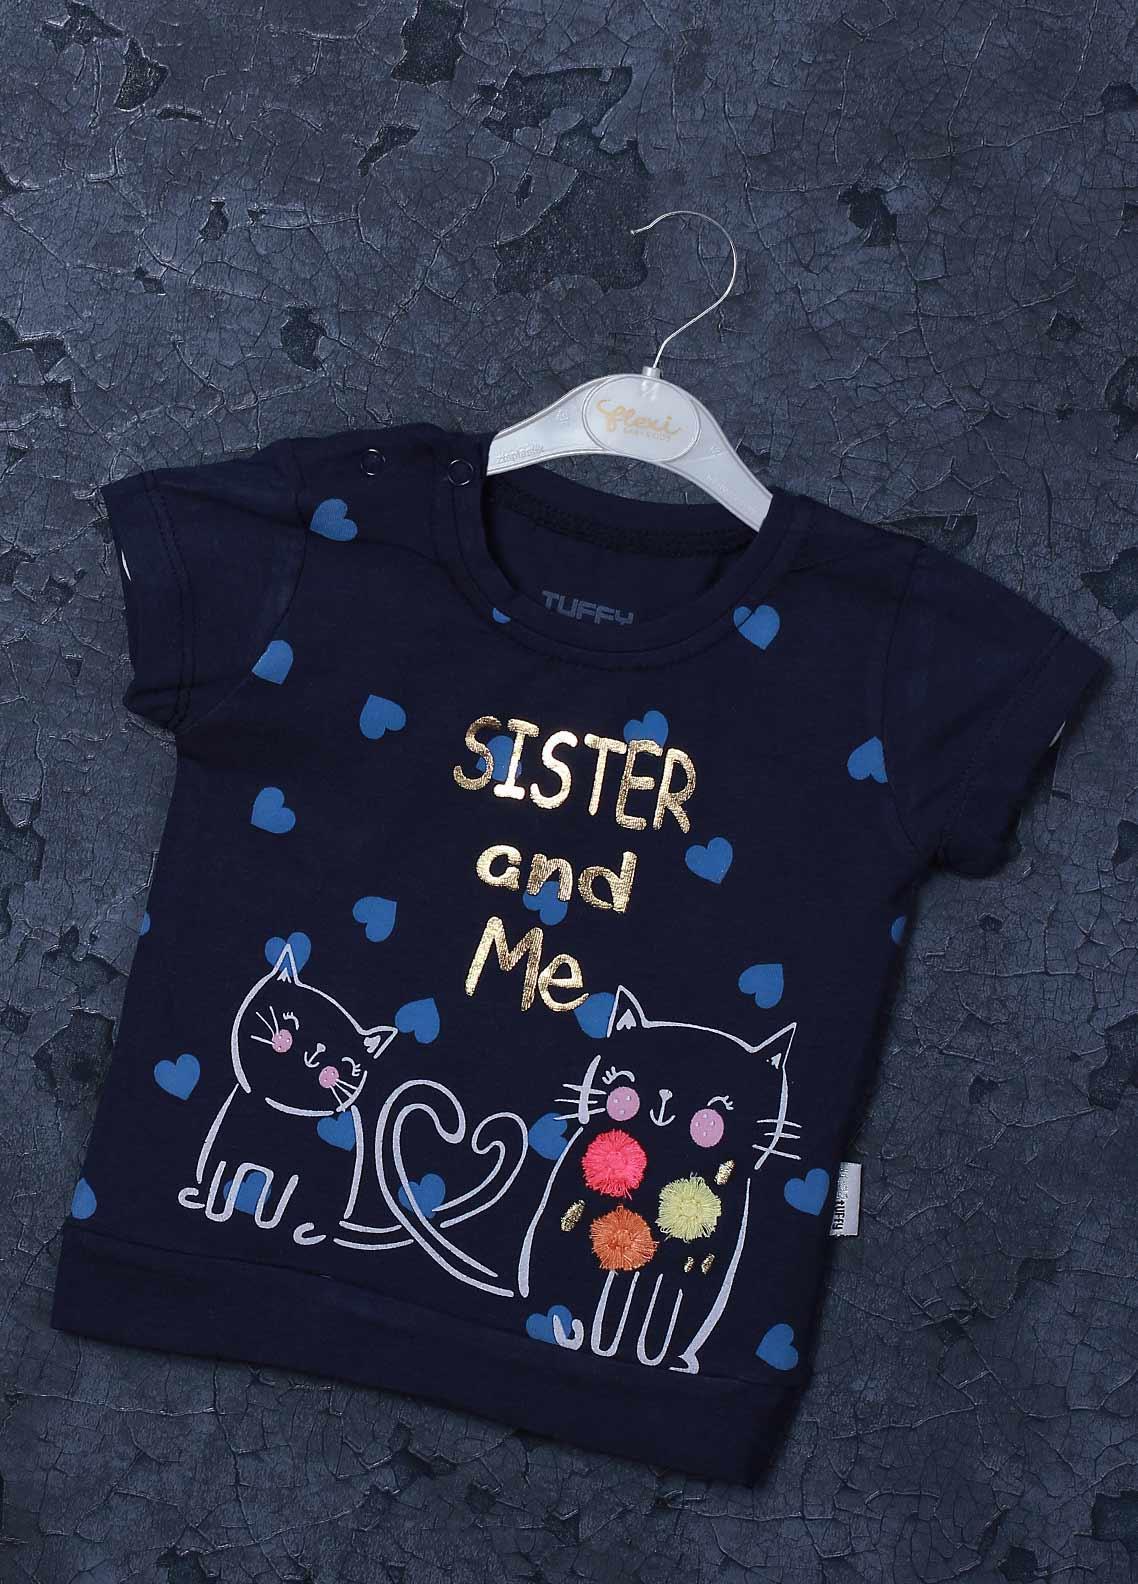 Sanaulla Exclusive Range Mix Cotton Printed T-Shirts for Girls -  98255 Navy Blue